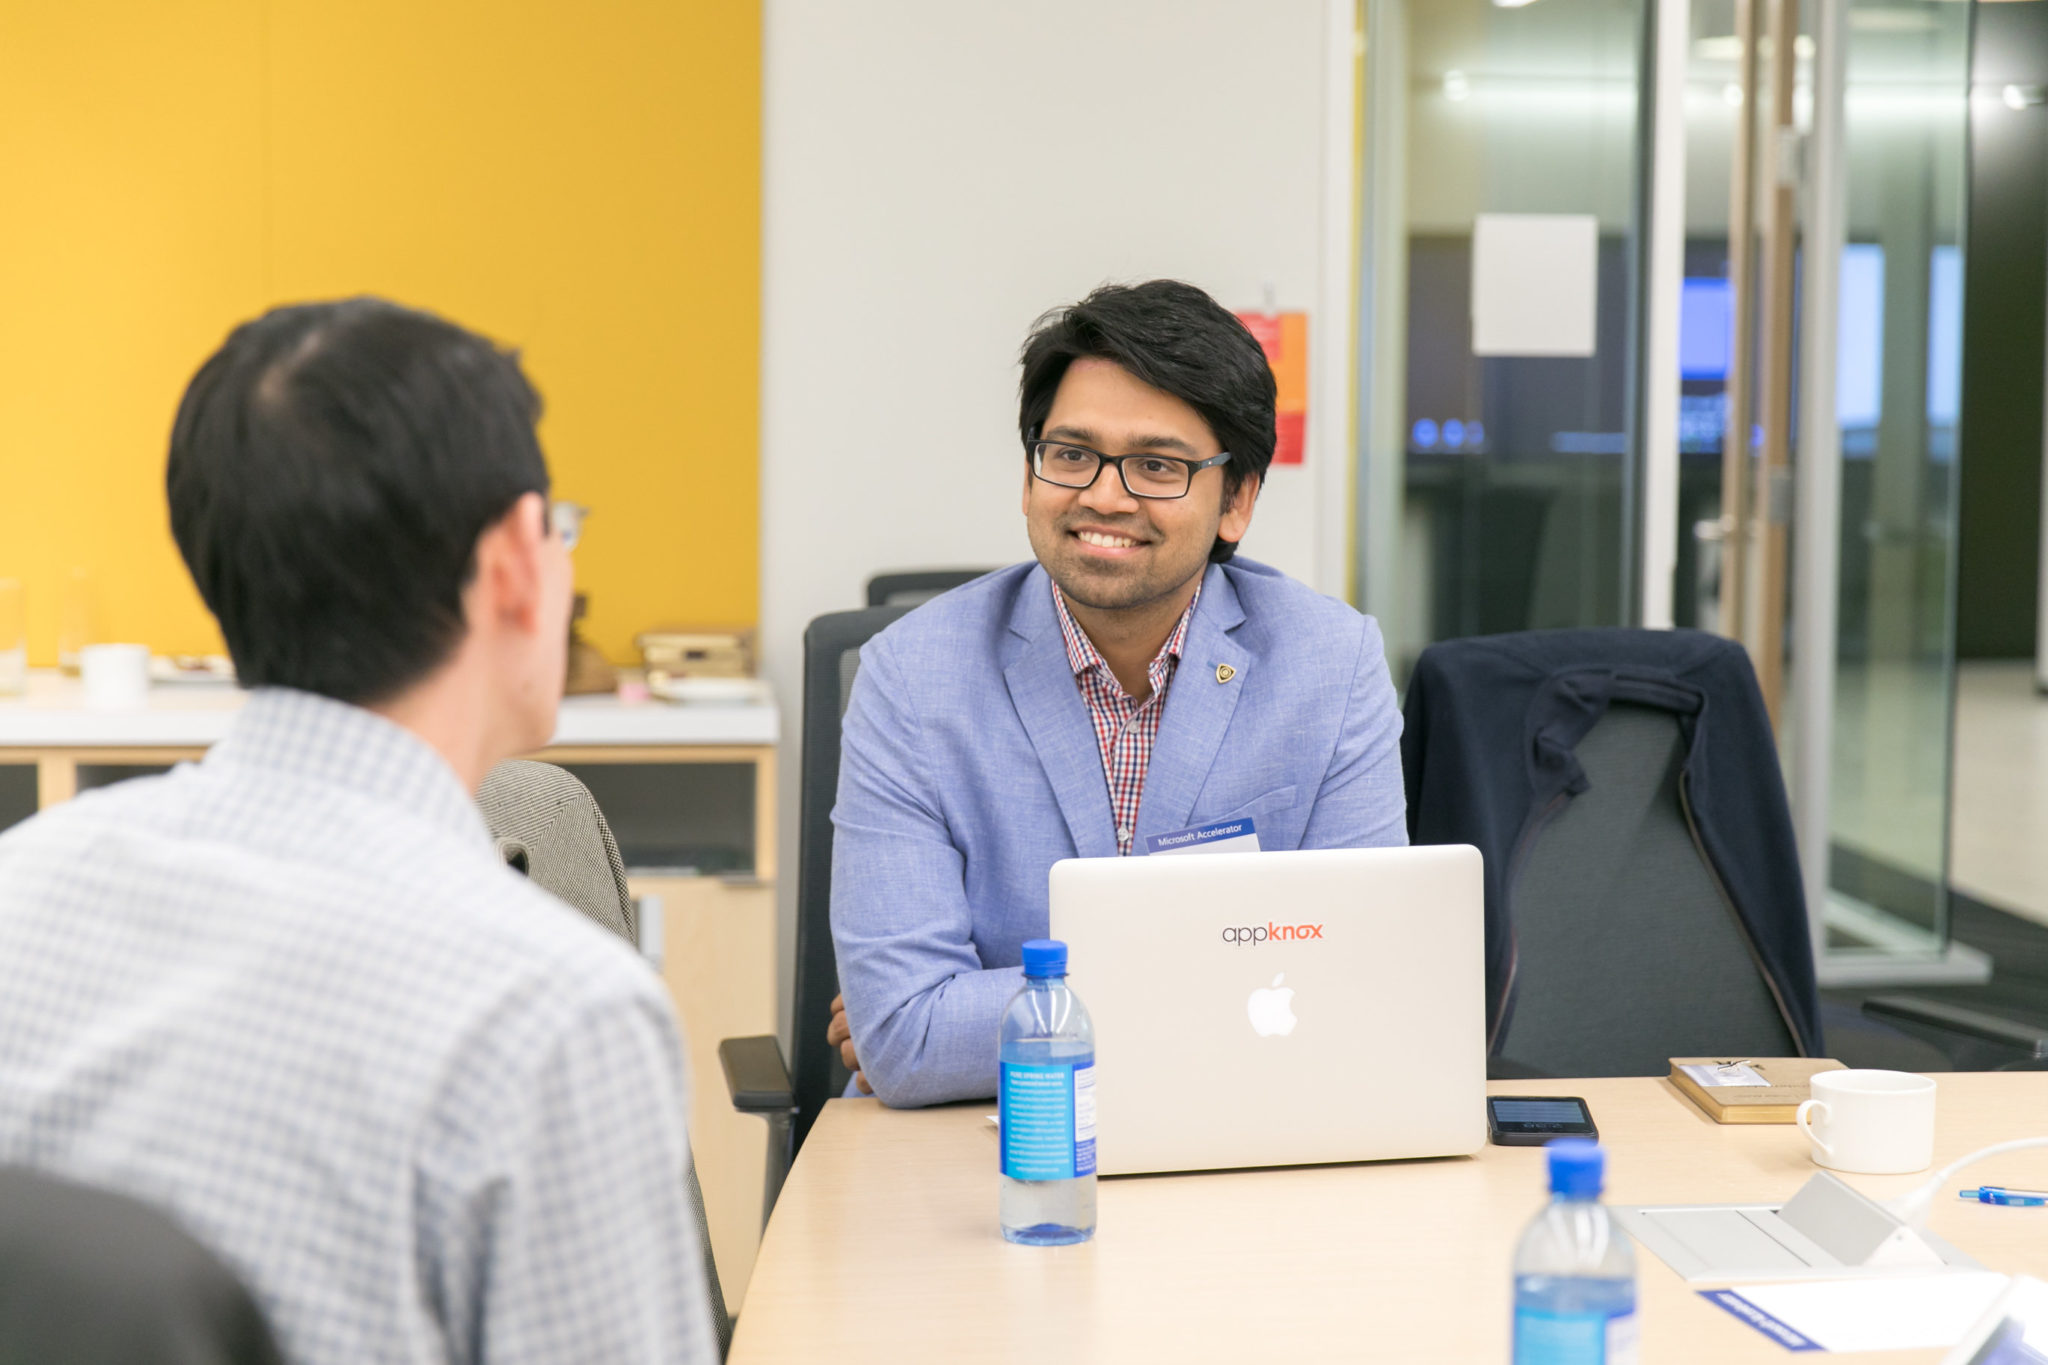 The Tech Panda founder Prateek Panda